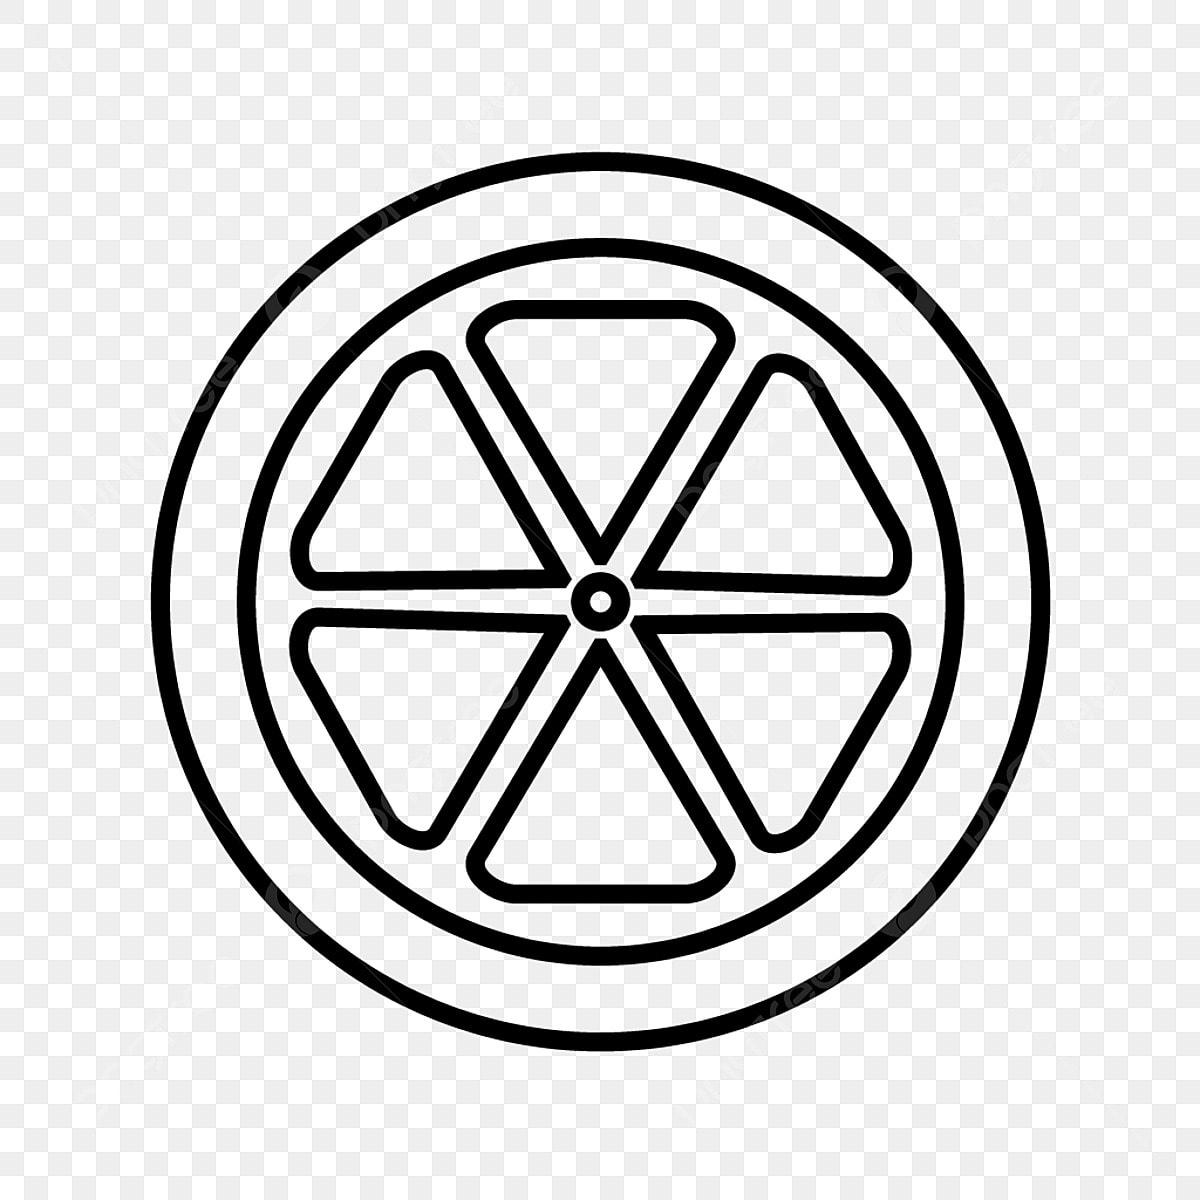 Orange Slice Line Black Icon, Orange Slice, Slice, Orange